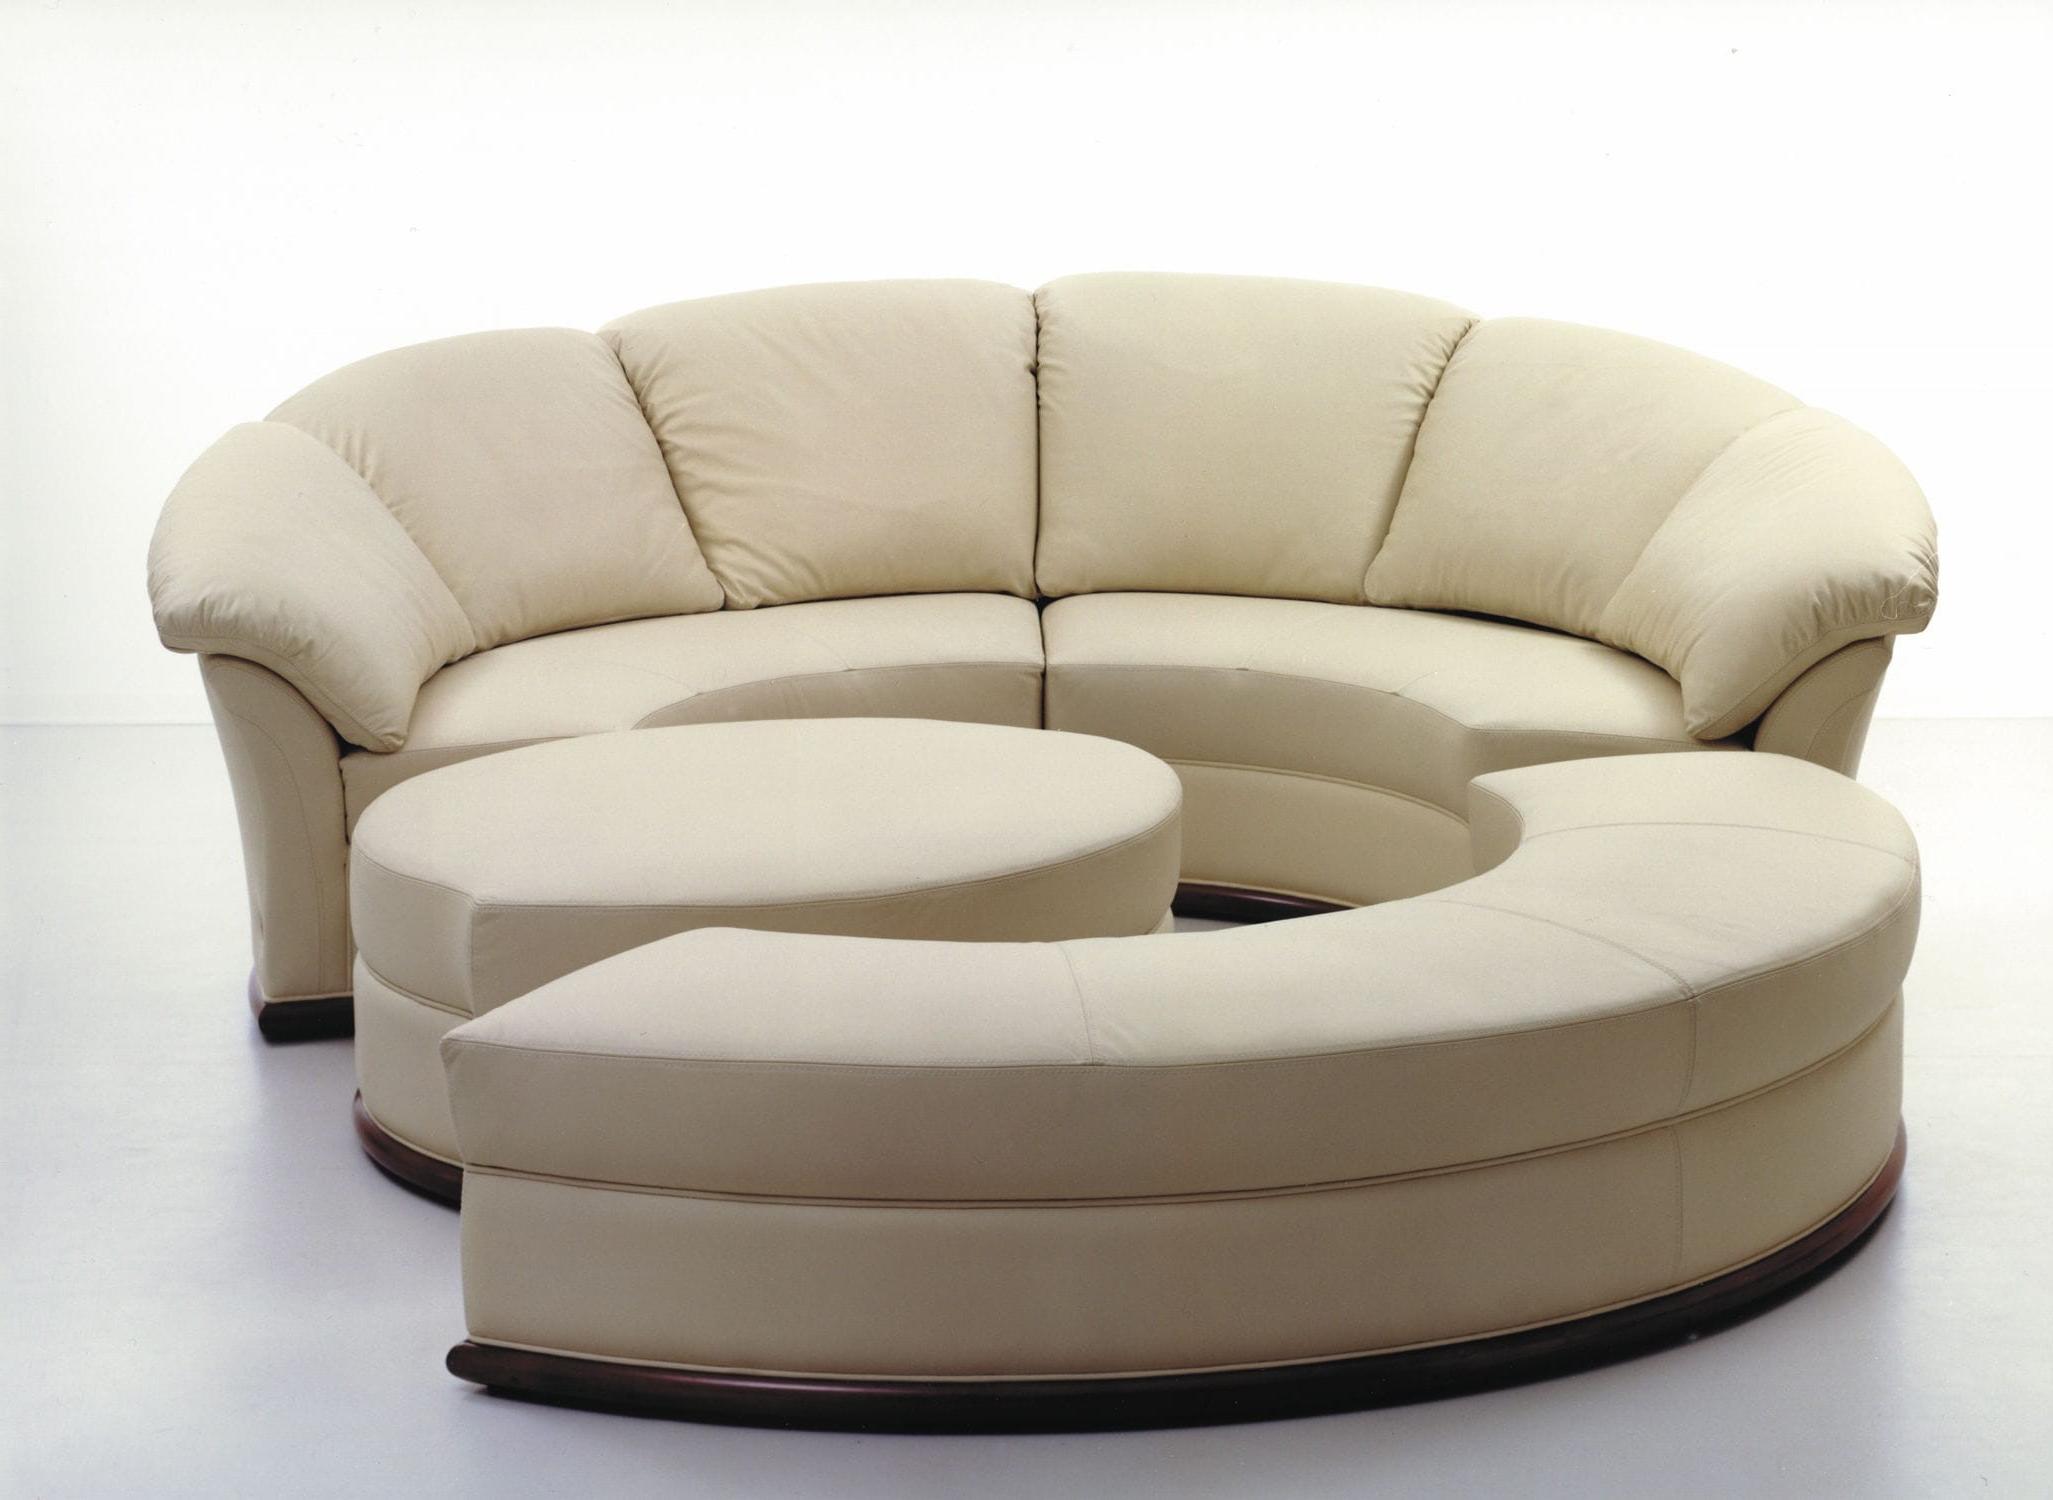 Sofas Redondos 87dx Fantastico sofas Redondos Rundes sofa Modulierbar Modern Leder